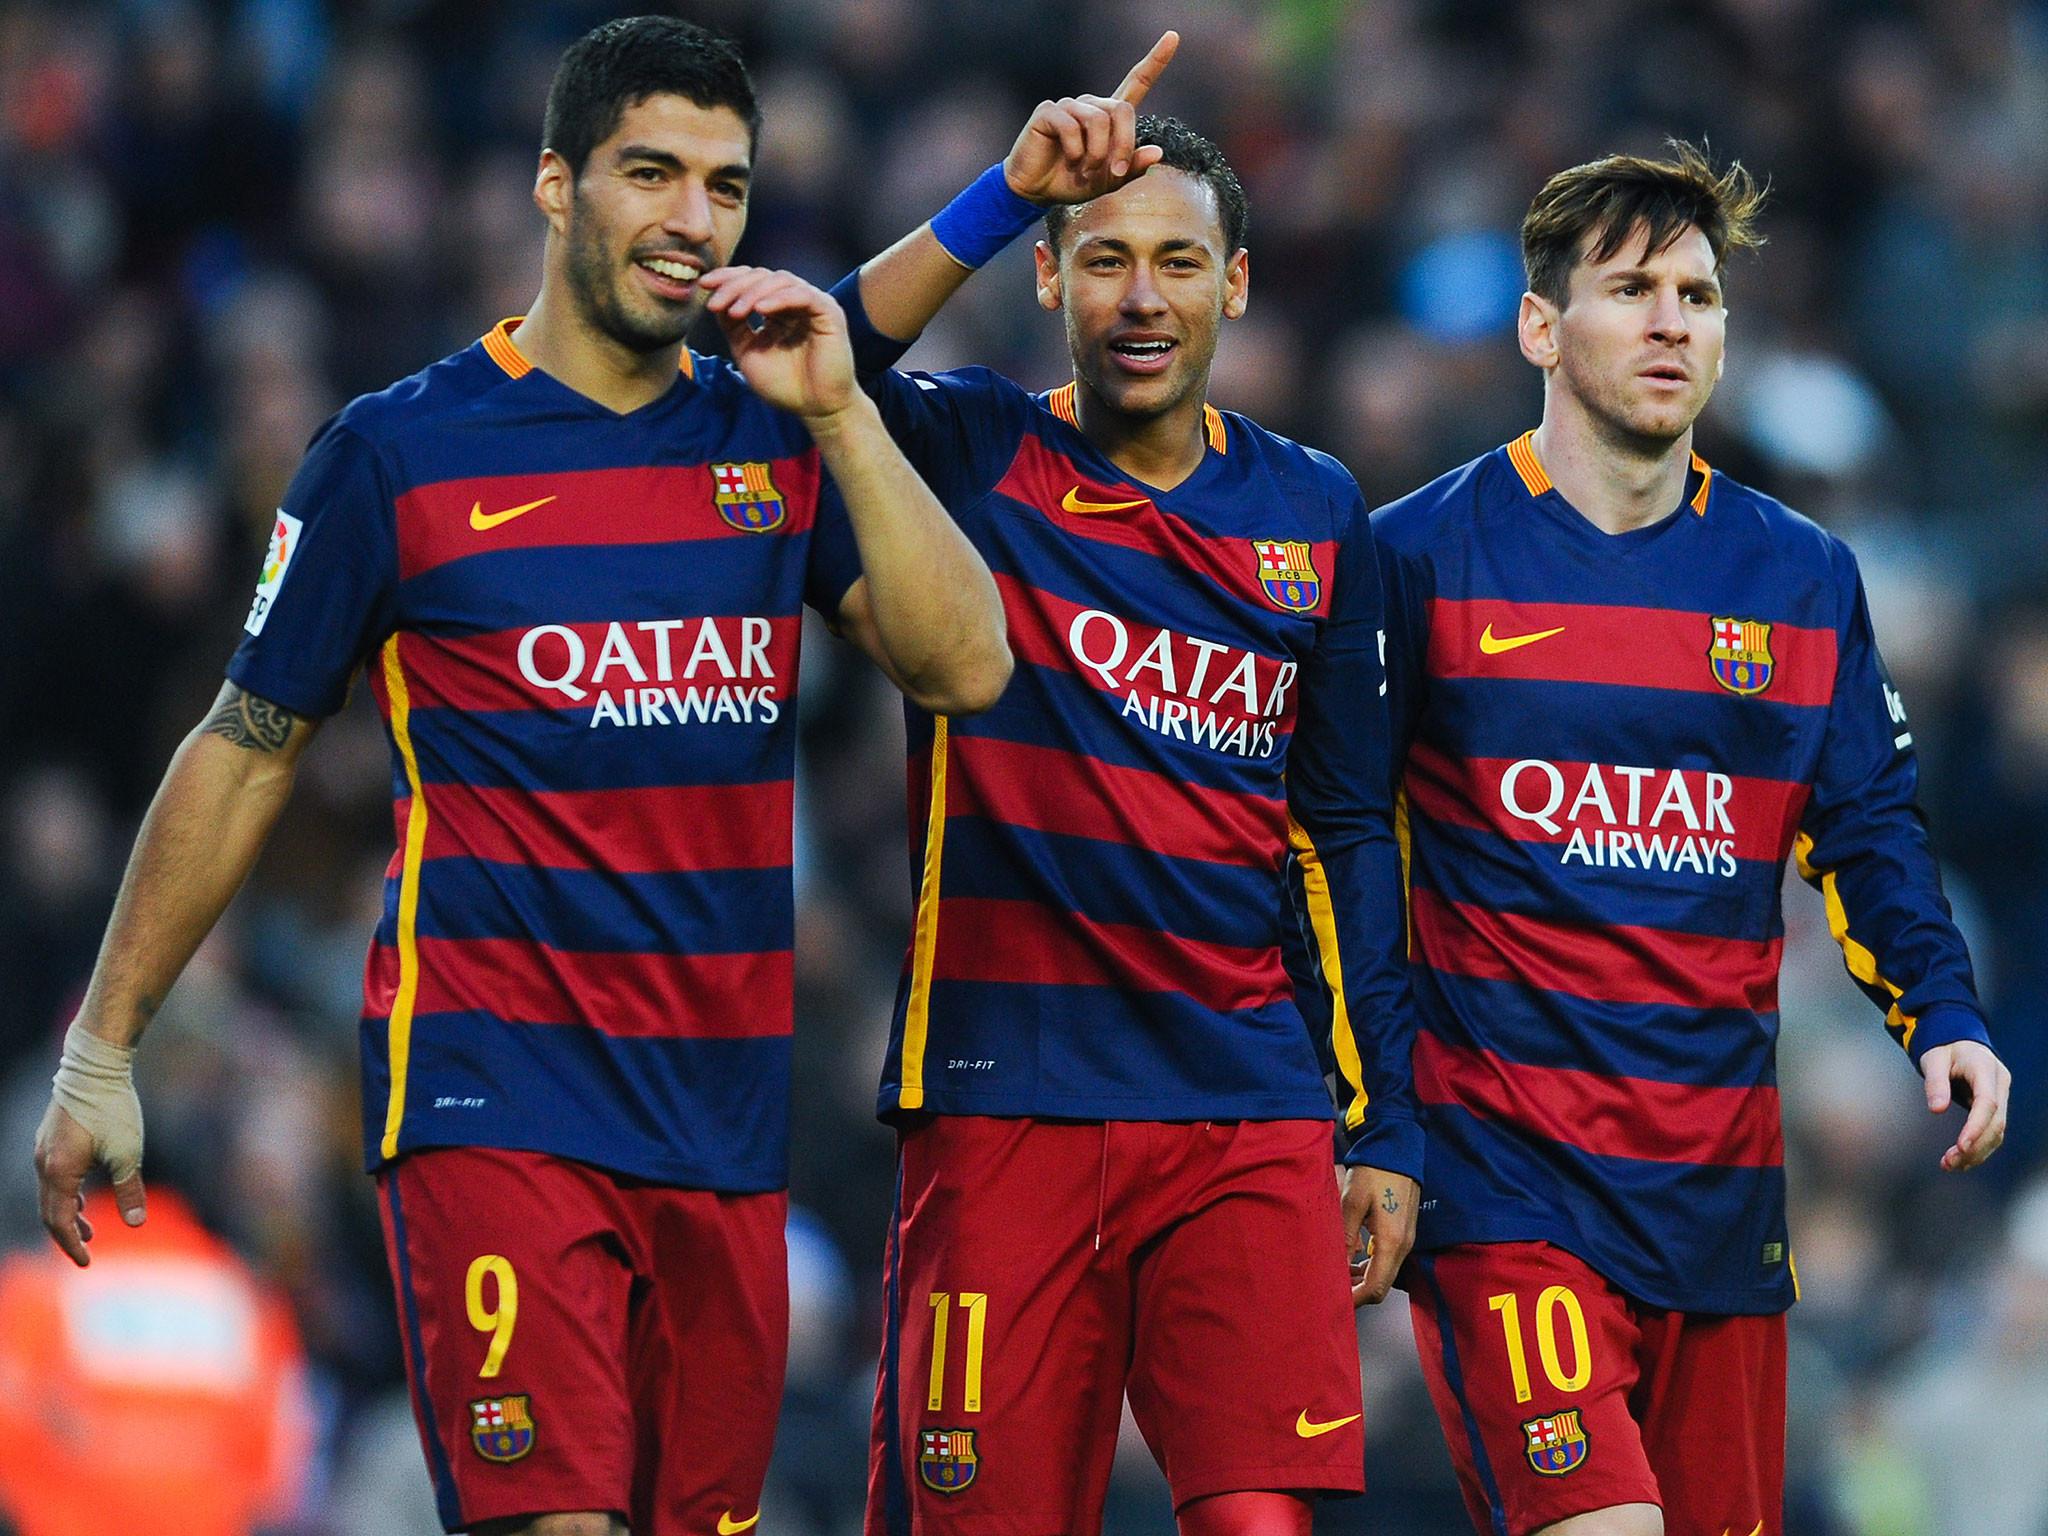 "Messi and Neymar want Suarez on Ballon d'Or shortlist, not Ronaldo. """